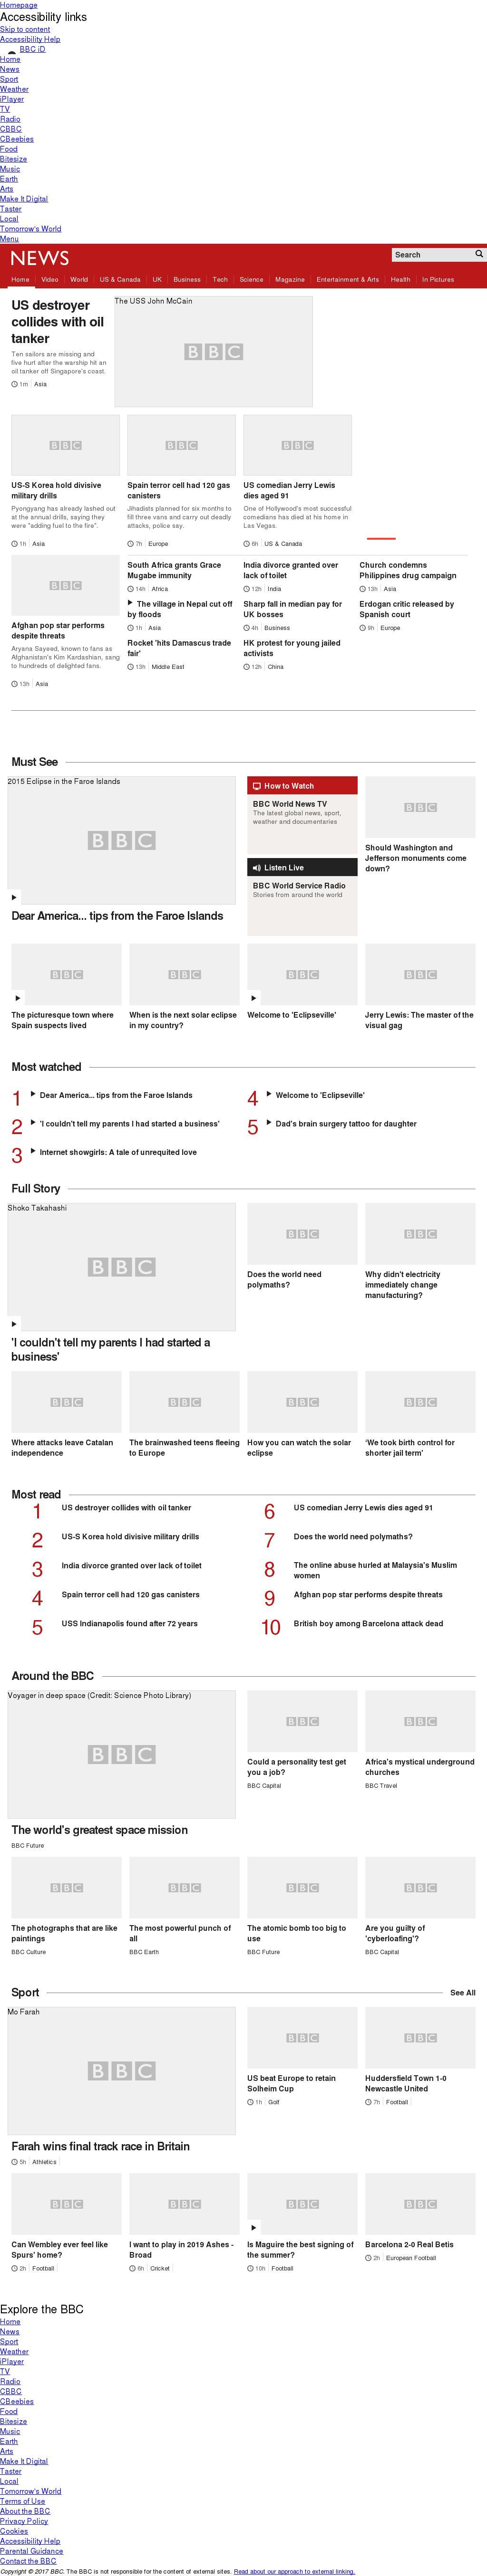 BBC at Monday Aug. 21, 2017, 3:01 a.m. UTC